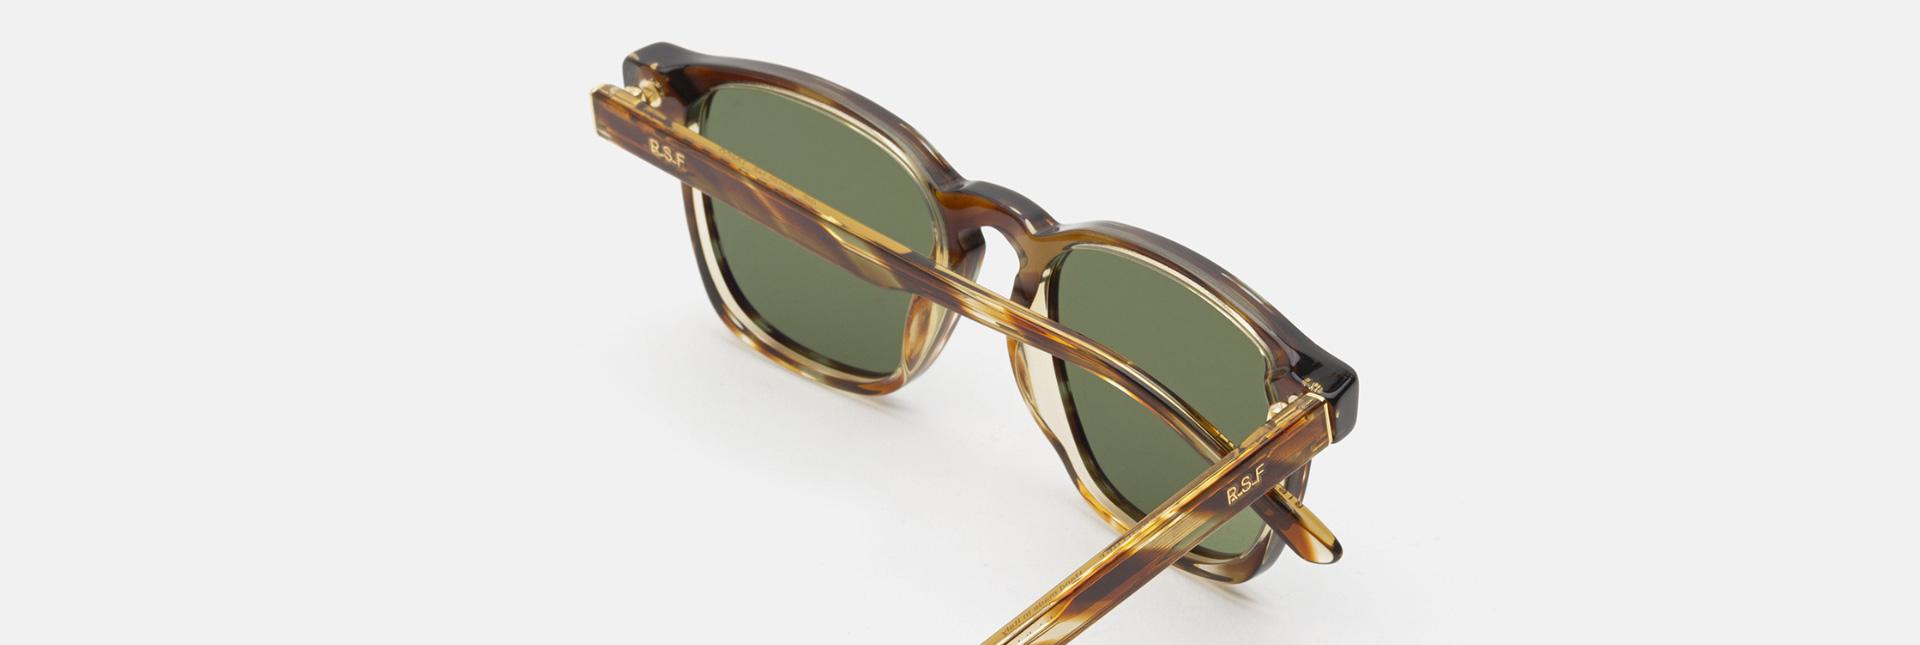 Retrosuperfuture® Sunglasses